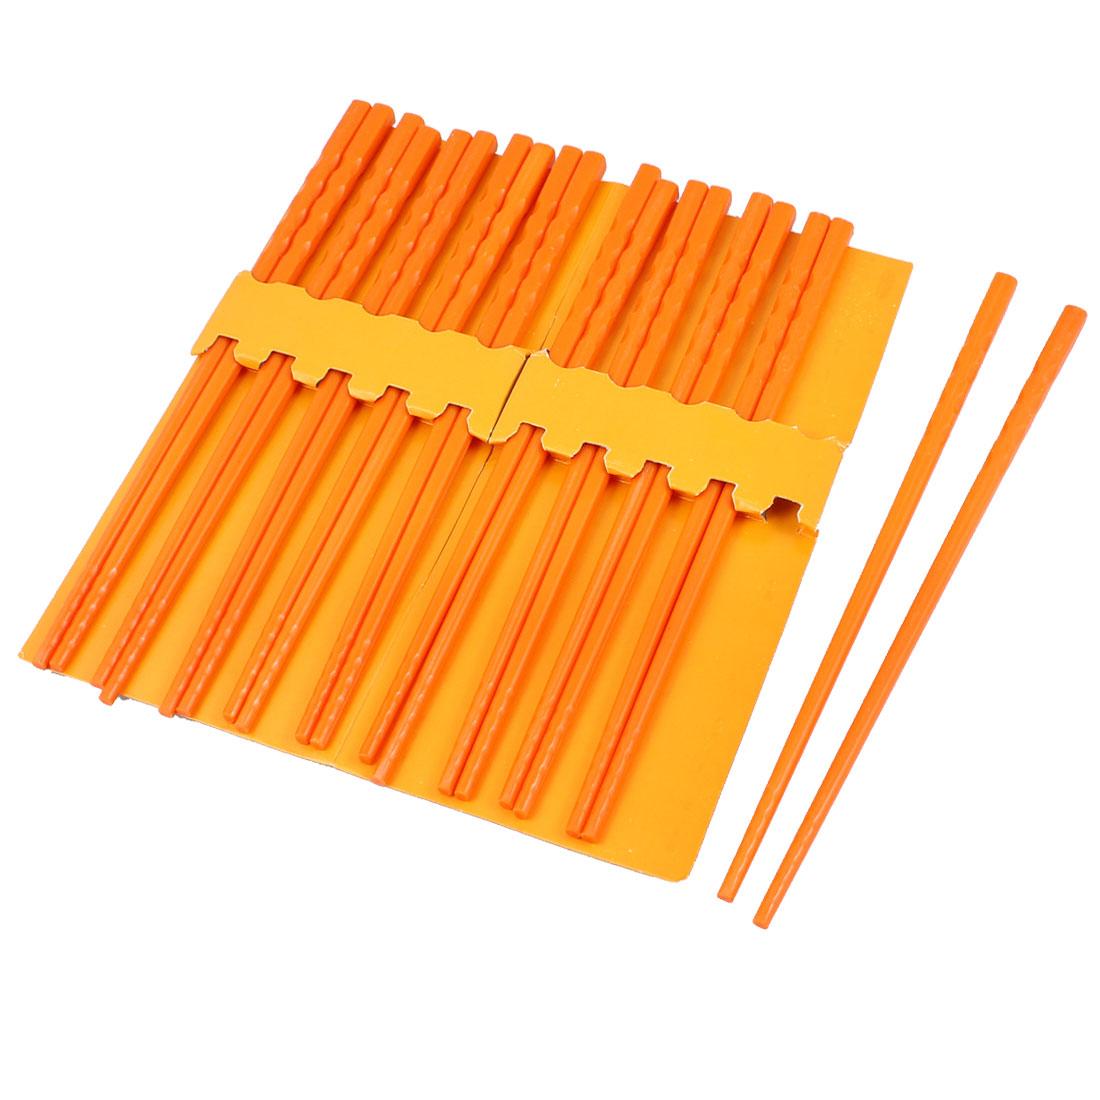 10 Pairs Kitchen Dishware Nonslip Plastic Chopsticks Orange